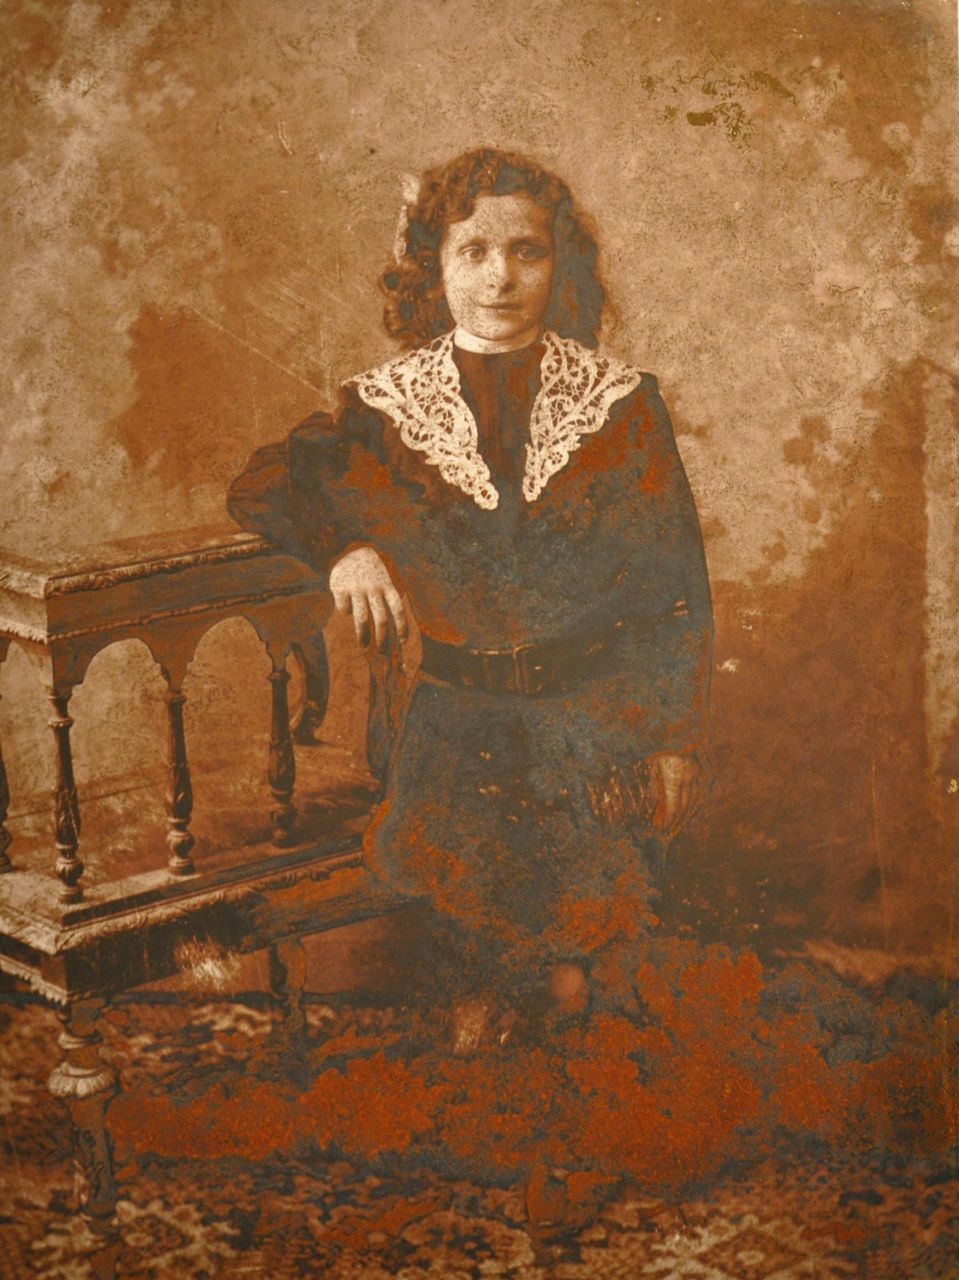 Ferdan Yusufi Antonella Sassanelli Neoartgallery 01